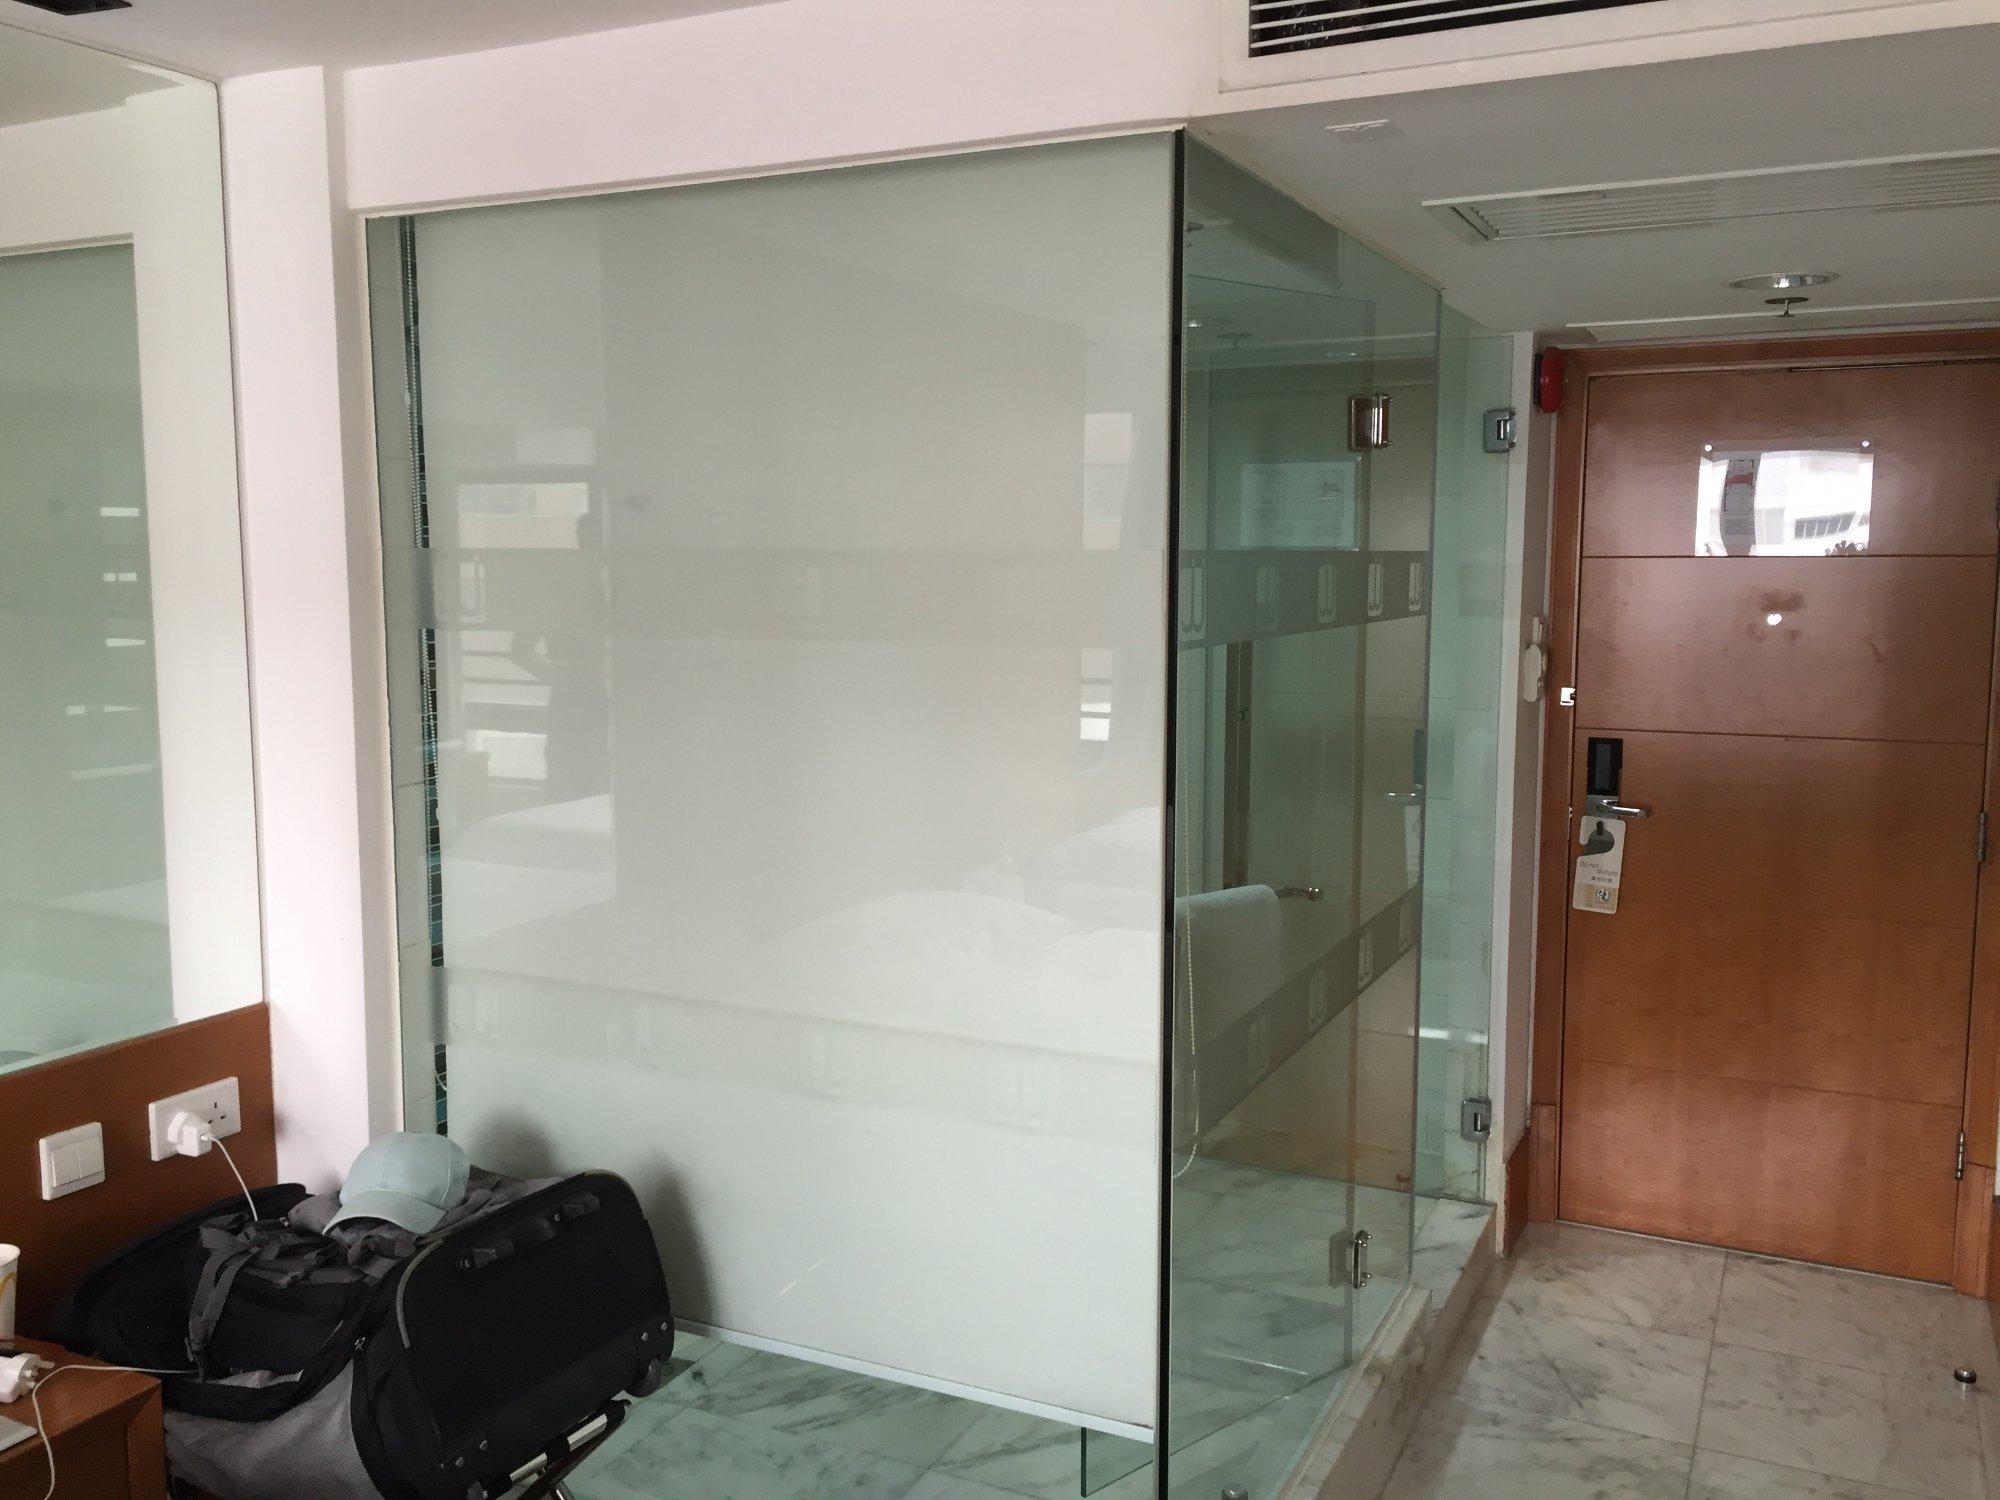 jj hotel updated 2017 reviews price comparison and 318 photos hong kong tripadvisor. Black Bedroom Furniture Sets. Home Design Ideas